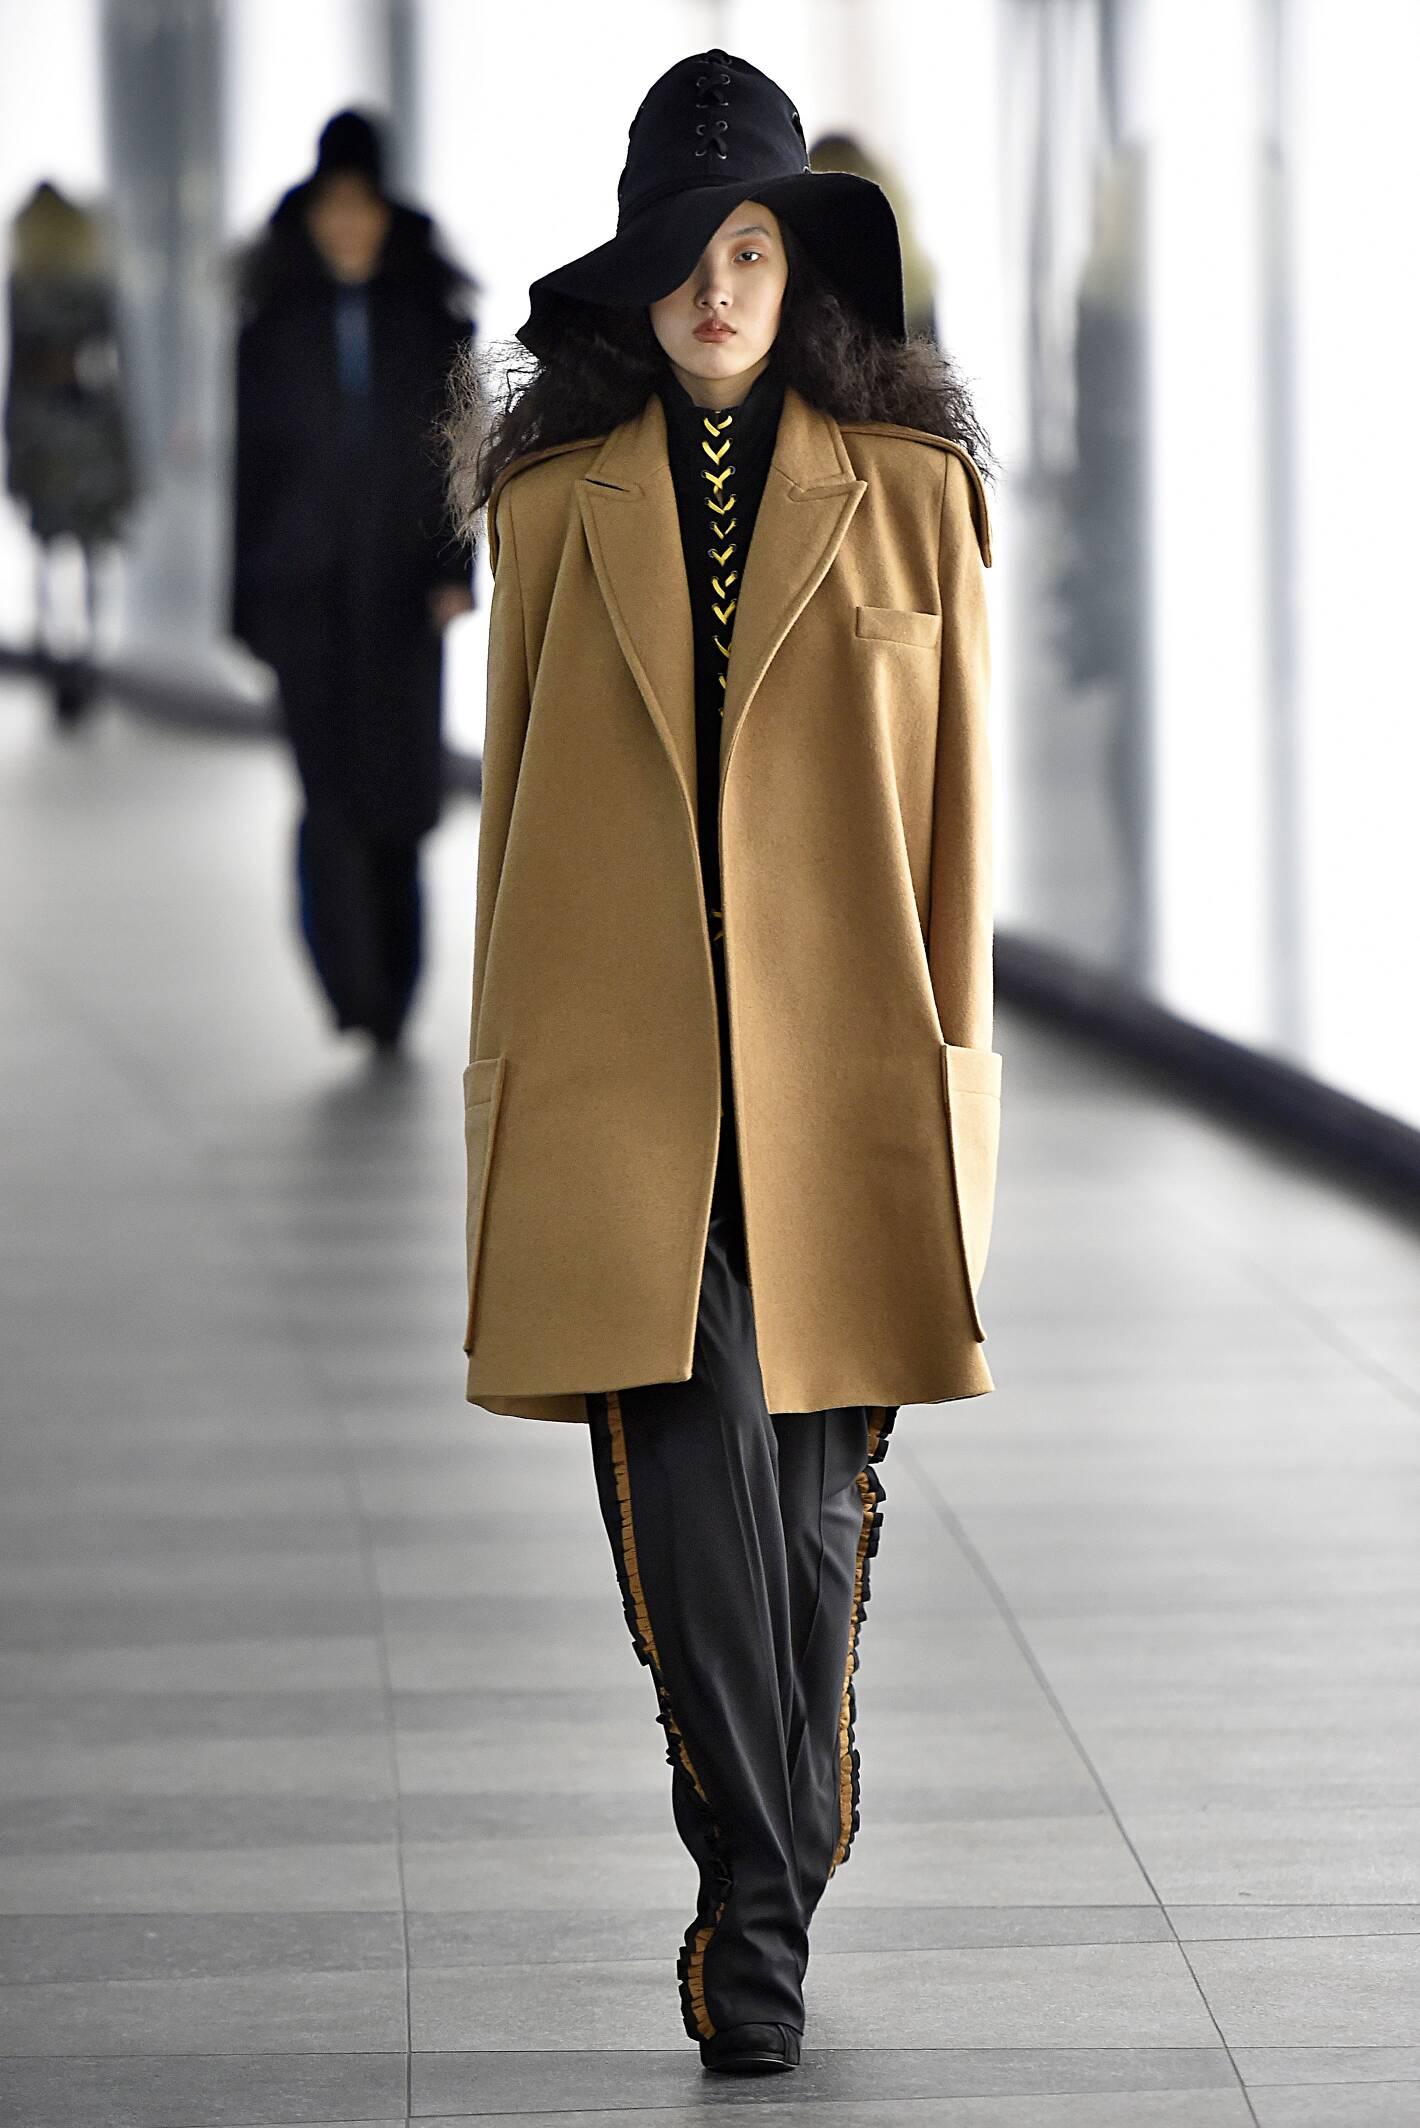 Catwalk Preen by Thornton Bregazzi Fall Winter 2015 16 Women's Collection London Fashion Week